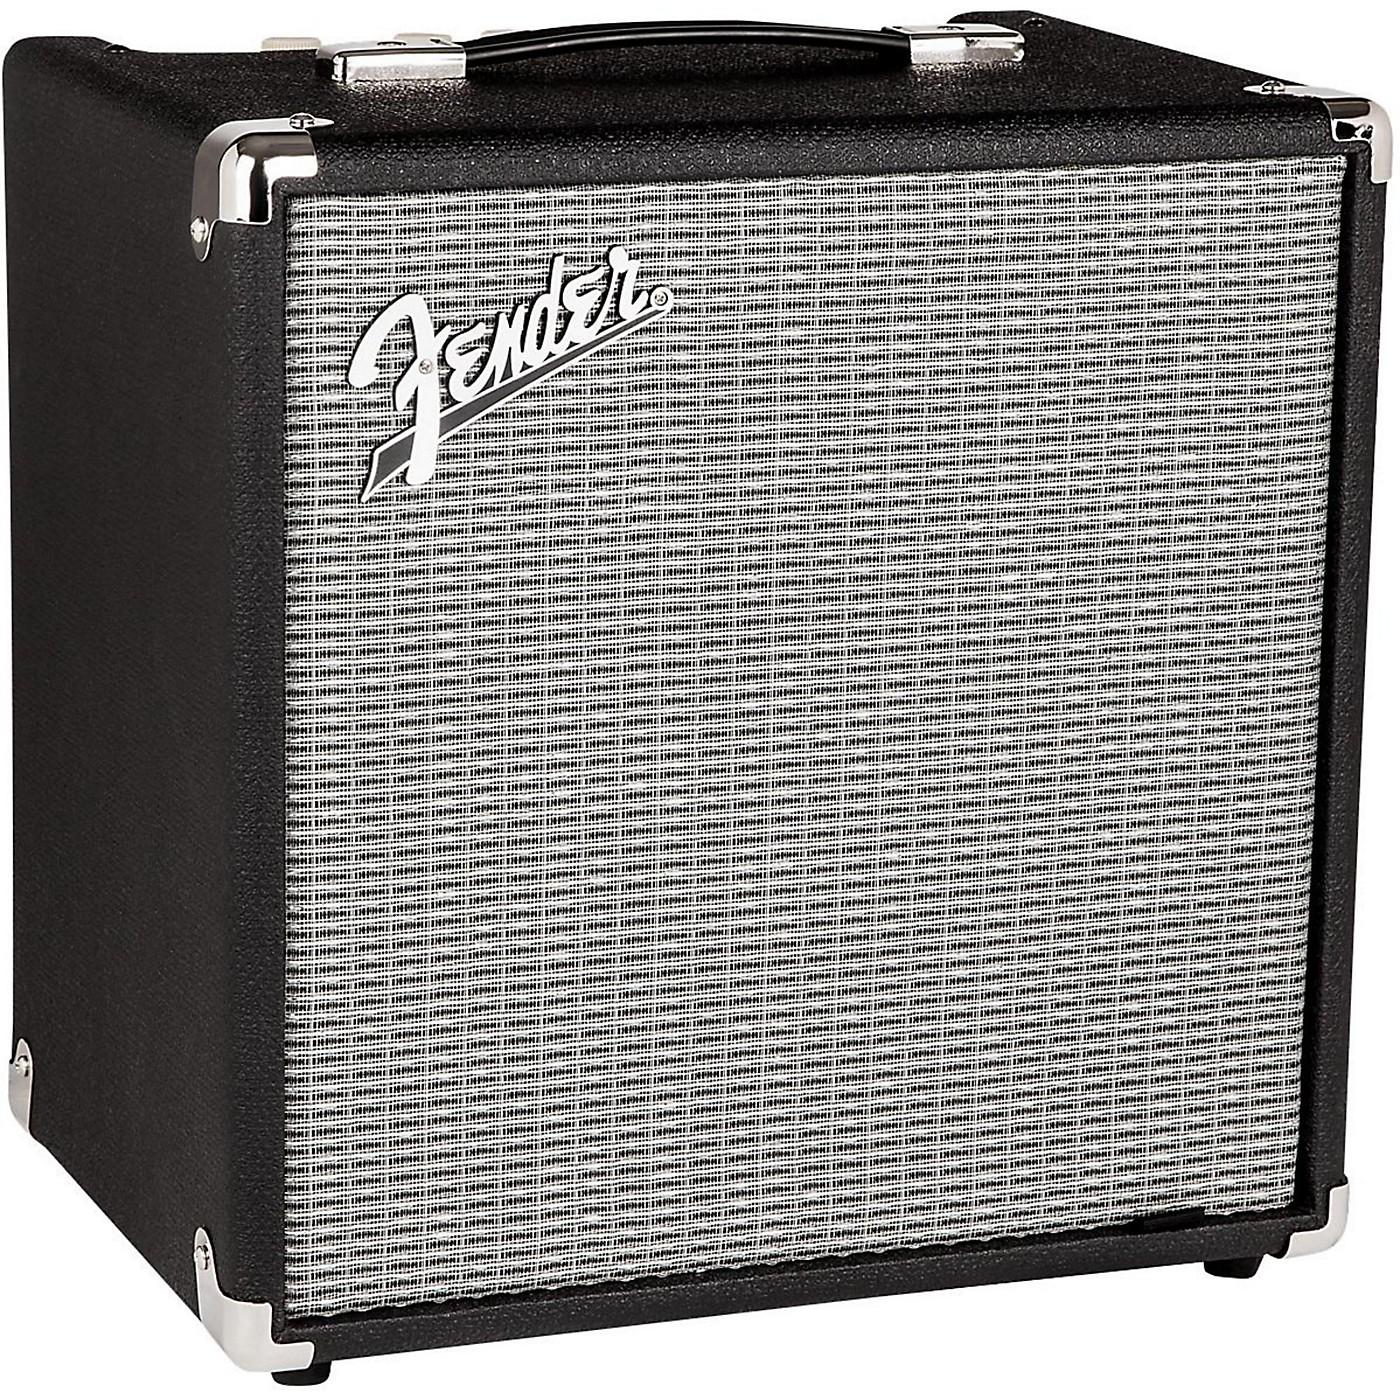 Fender RUMBLE 25 1x8 25W Bass Combo Amp thumbnail